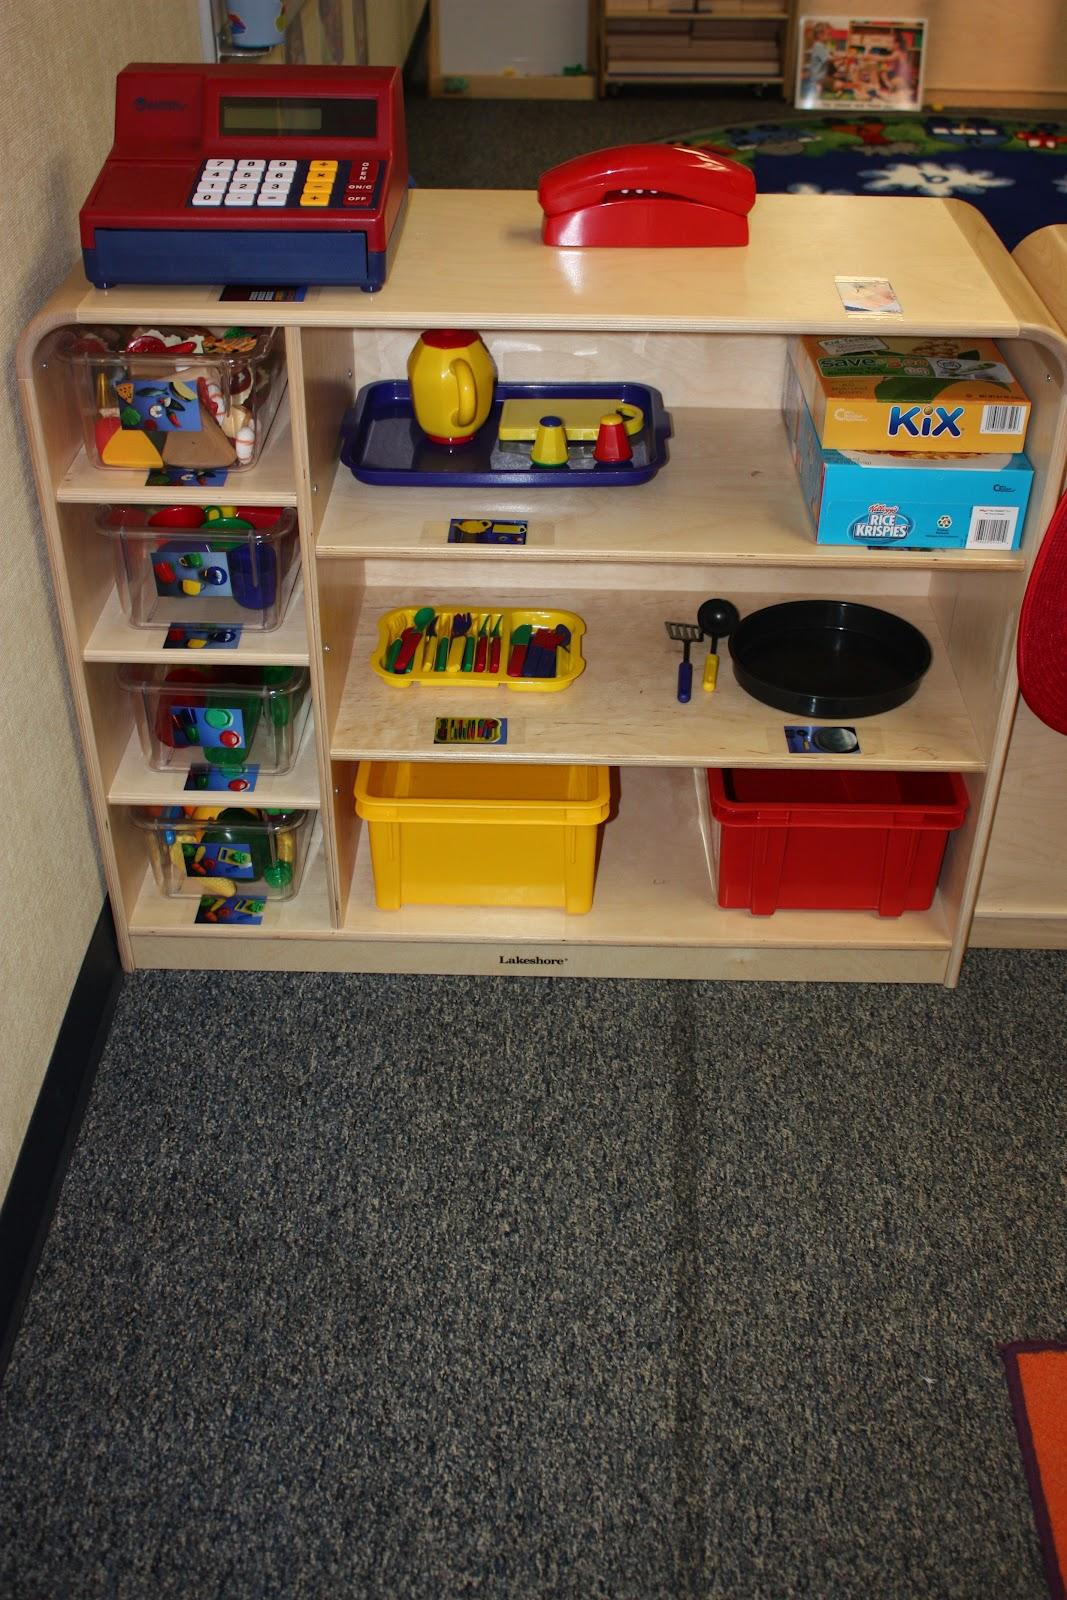 July+2012+090 - Pre Kindergarten Classroom Setup